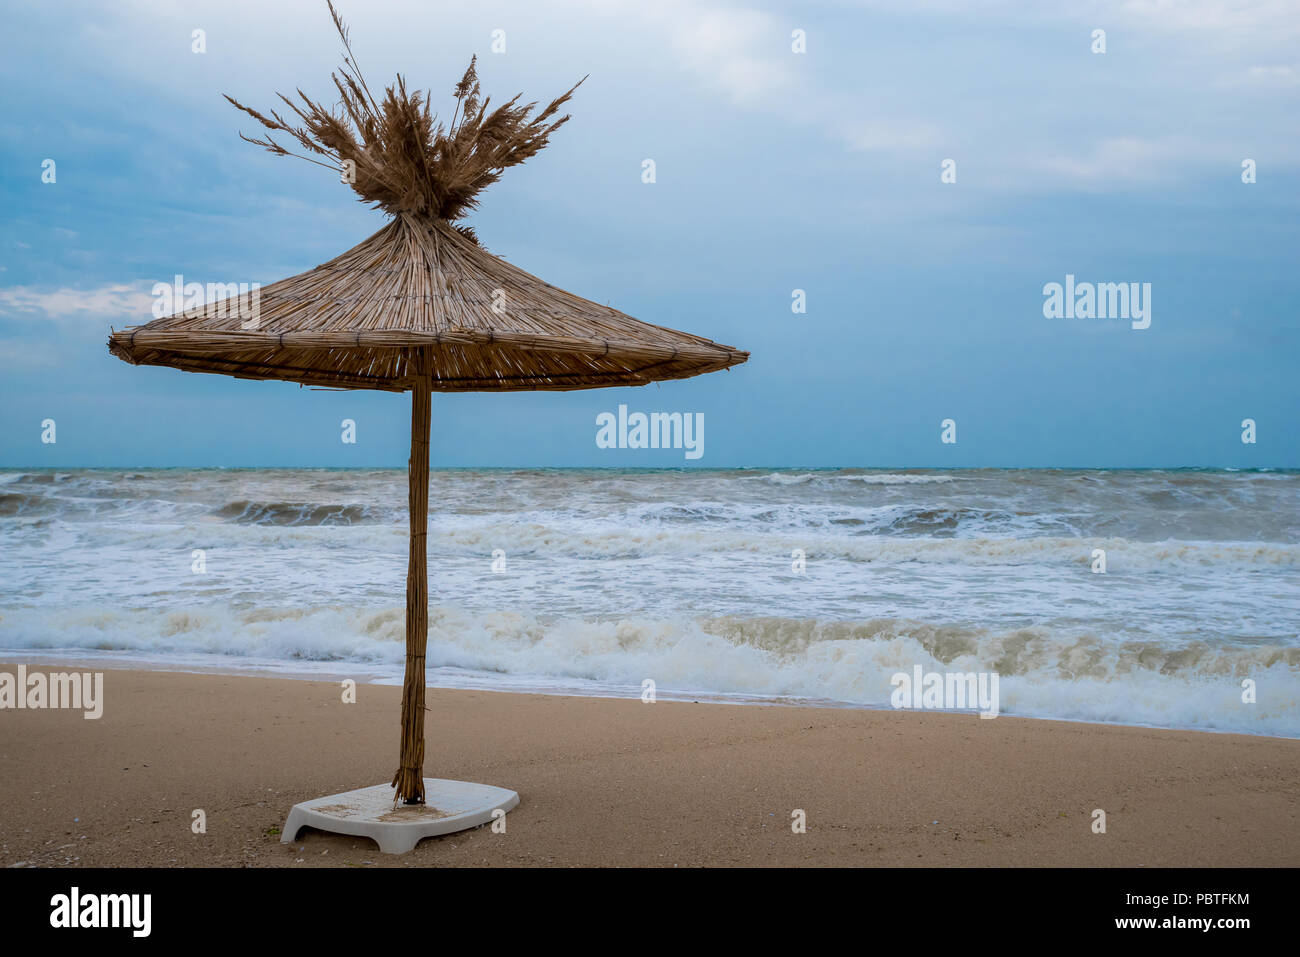 Straw umbrella on a beautiful beach - Europe, Bulgaria. - Stock Image